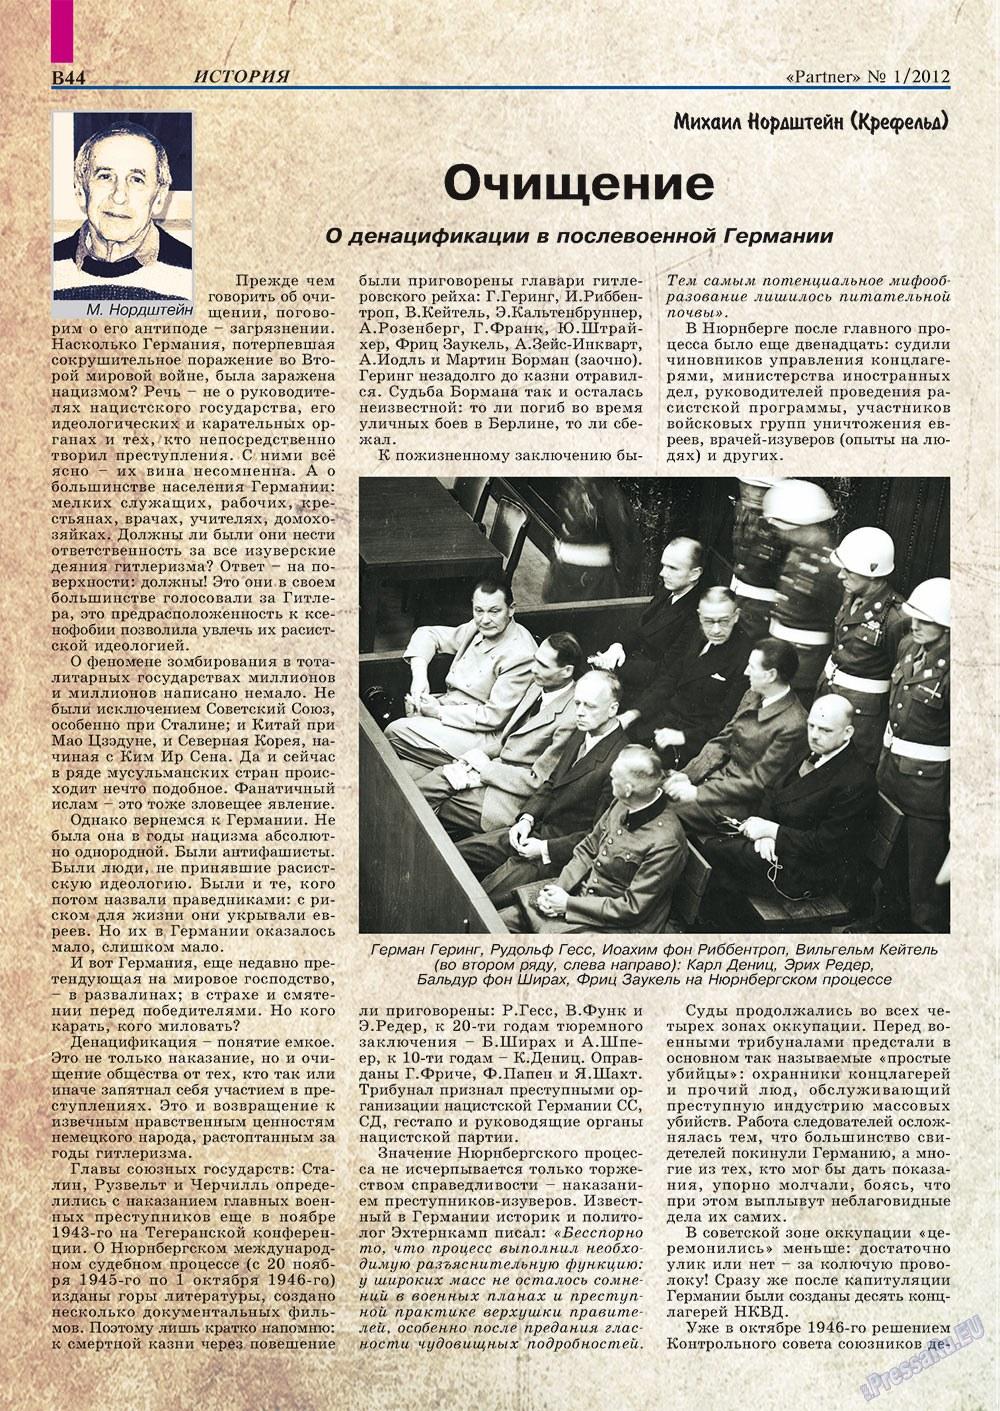 Партнер-север (журнал). 2012 год, номер 1, стр. 54